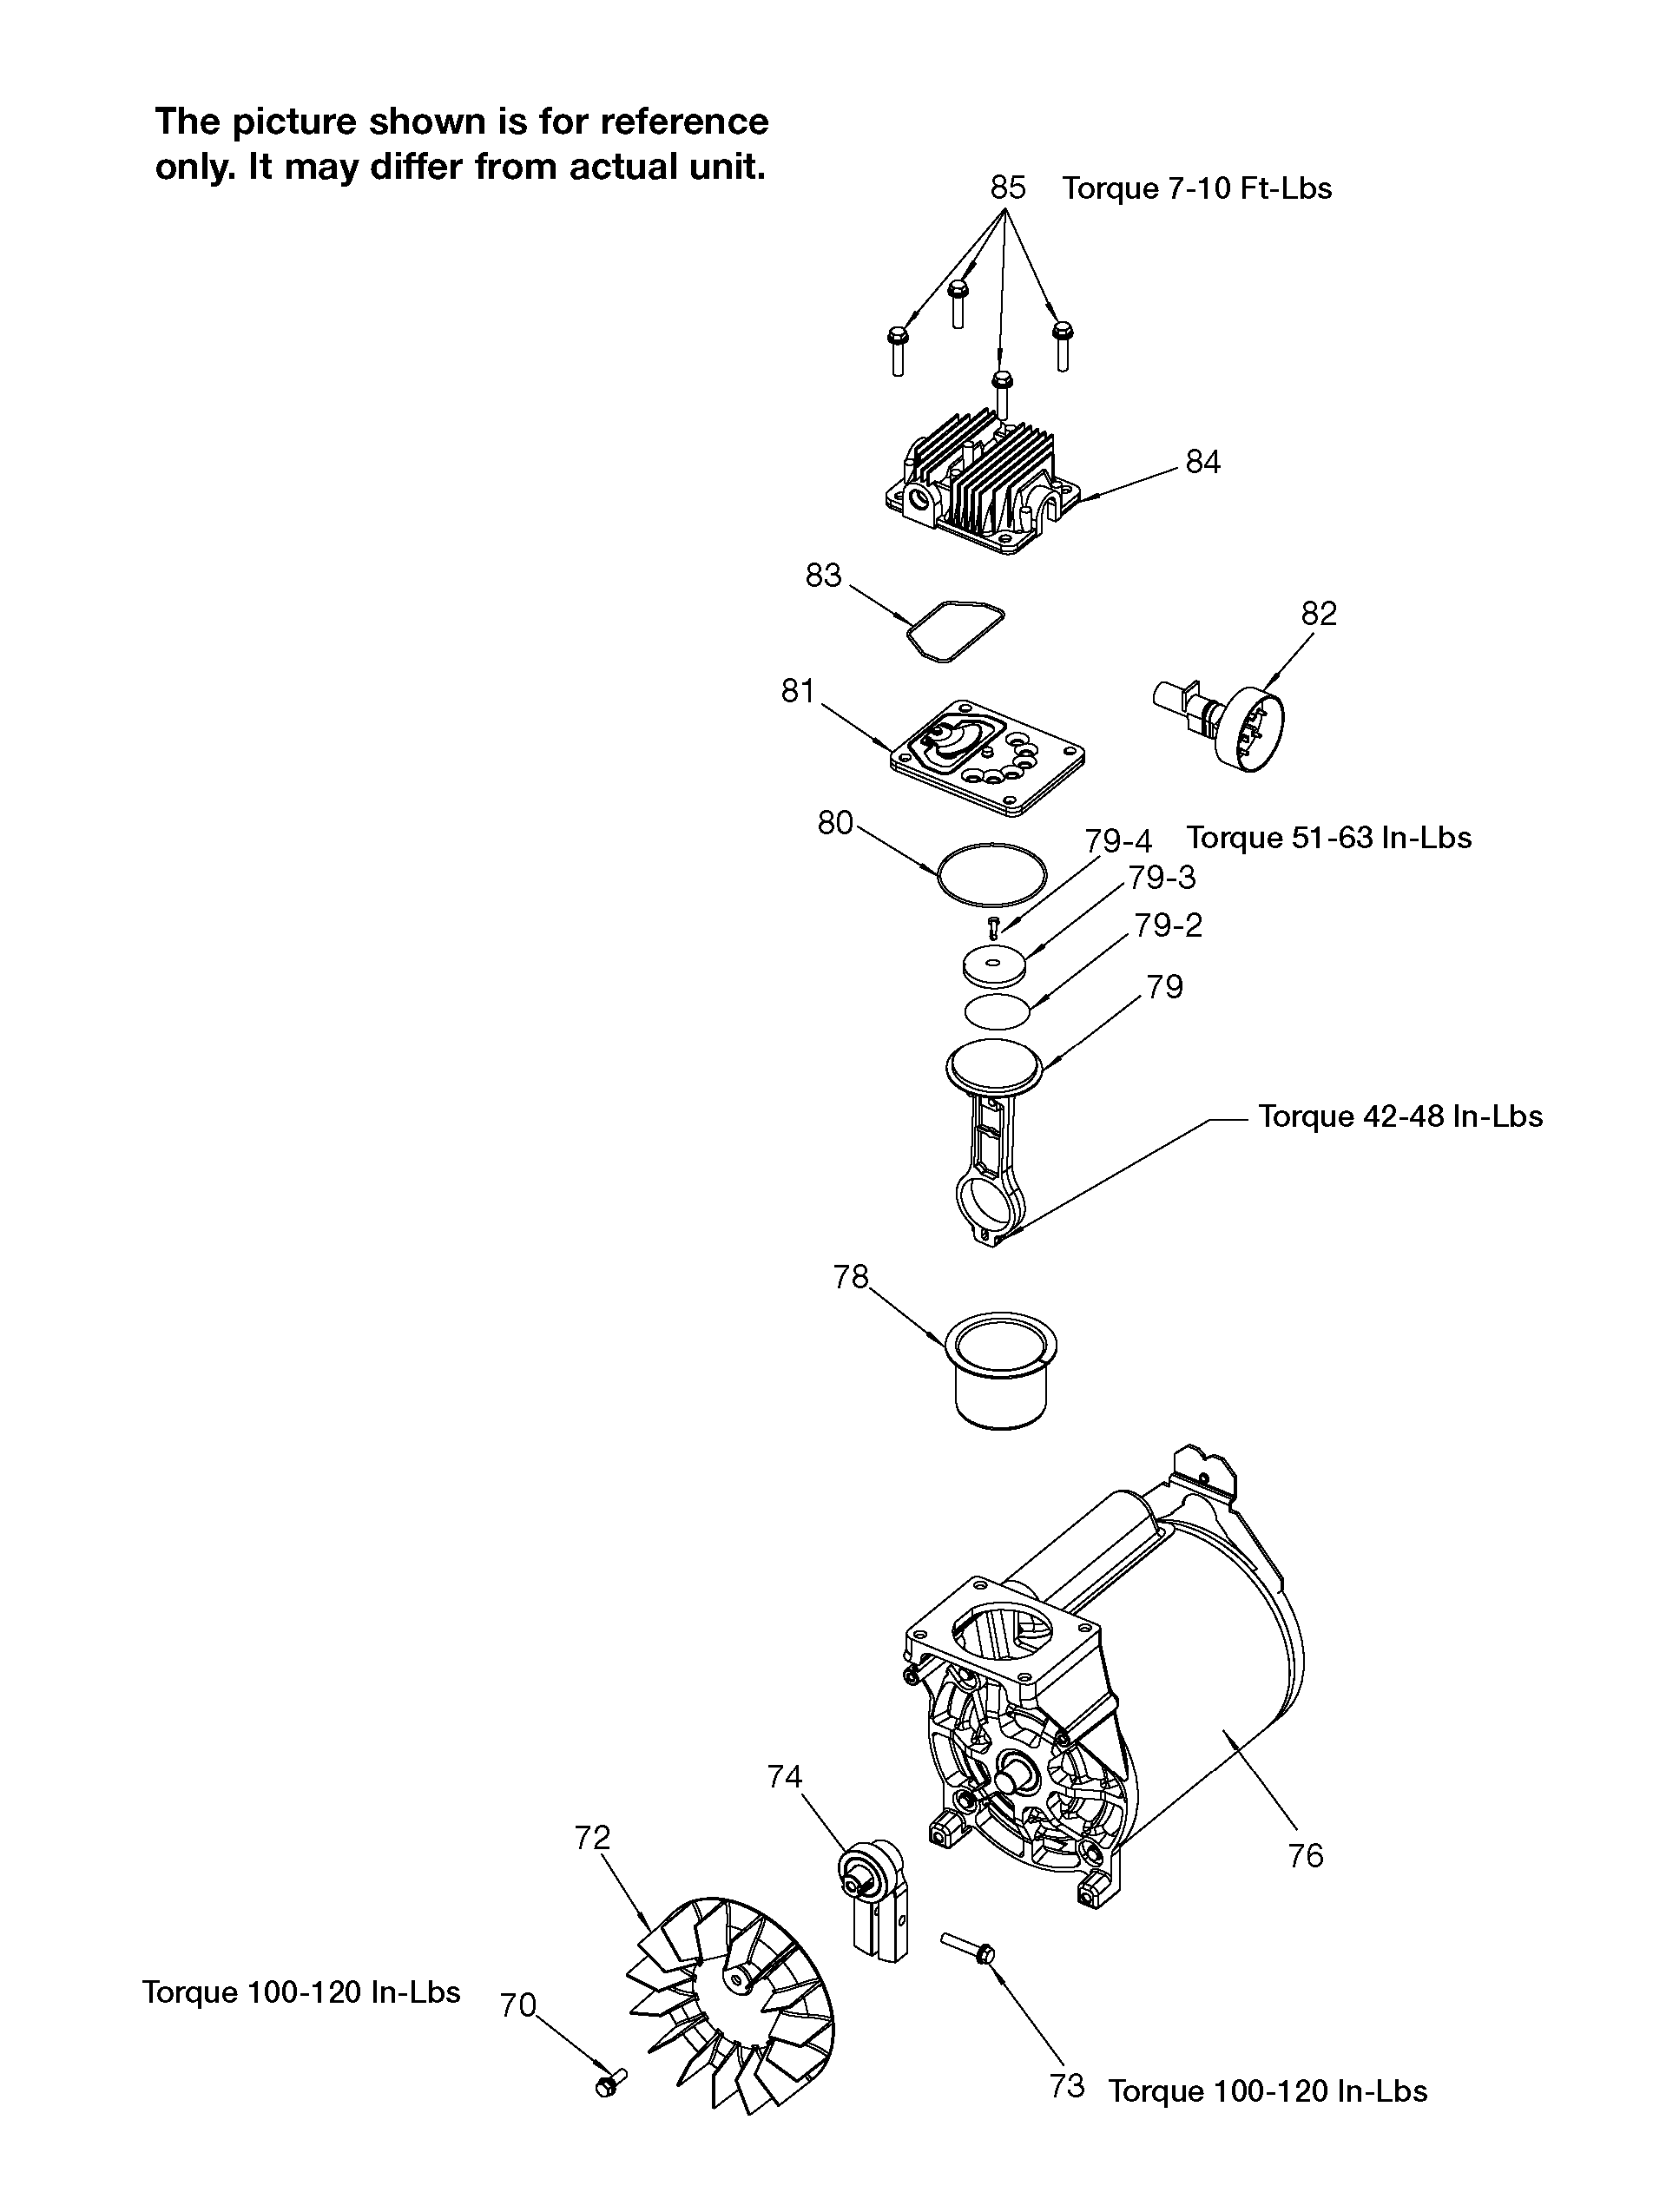 919-23754-Devilbiss-T0-PB-1Break Down